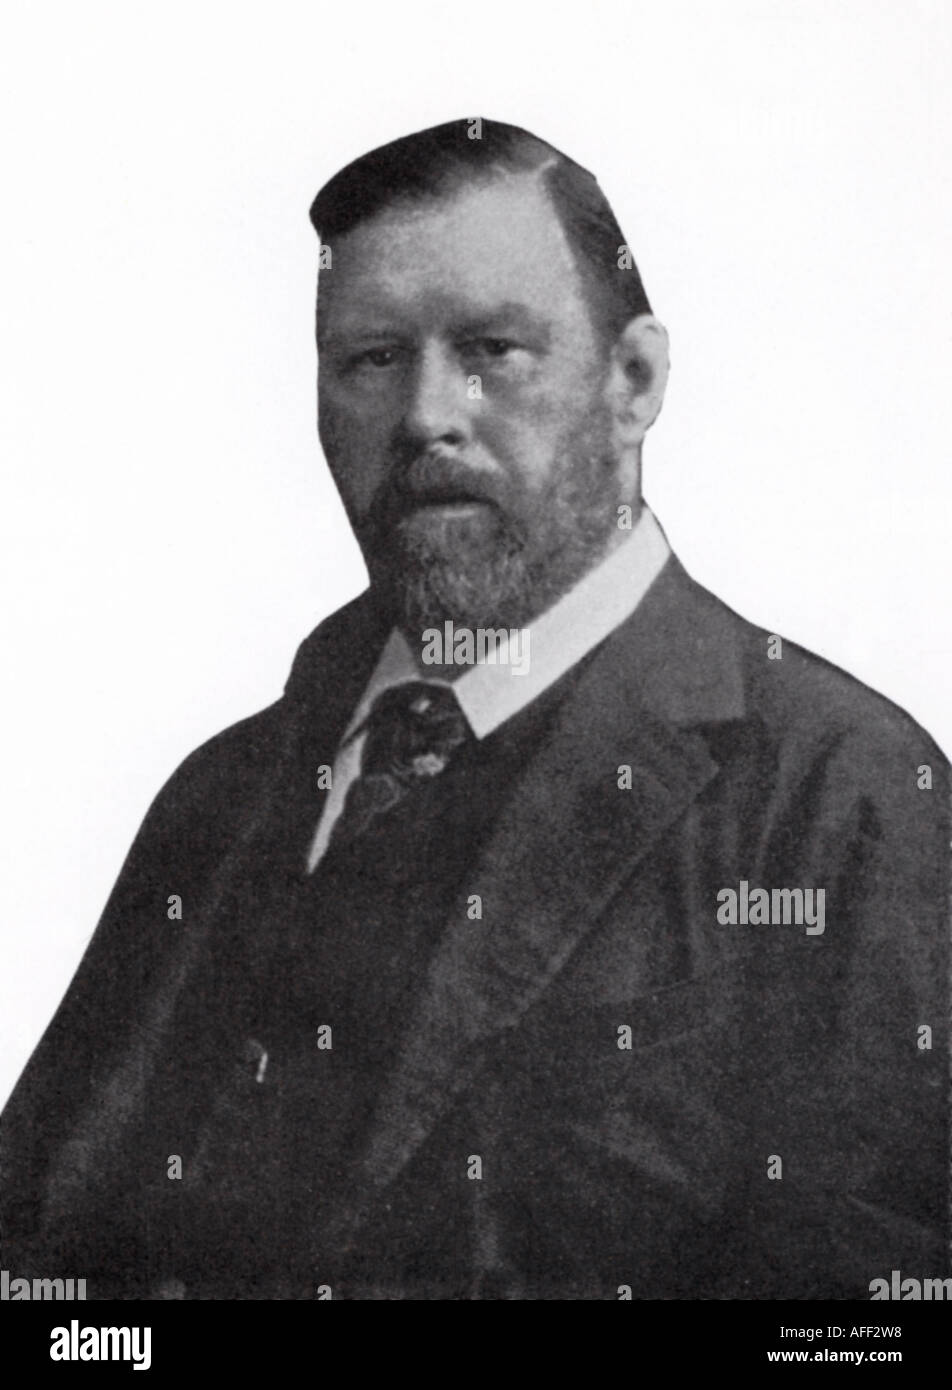 BRAM STOKER 1847 to 1912 Irish author of Dracula - Stock Image